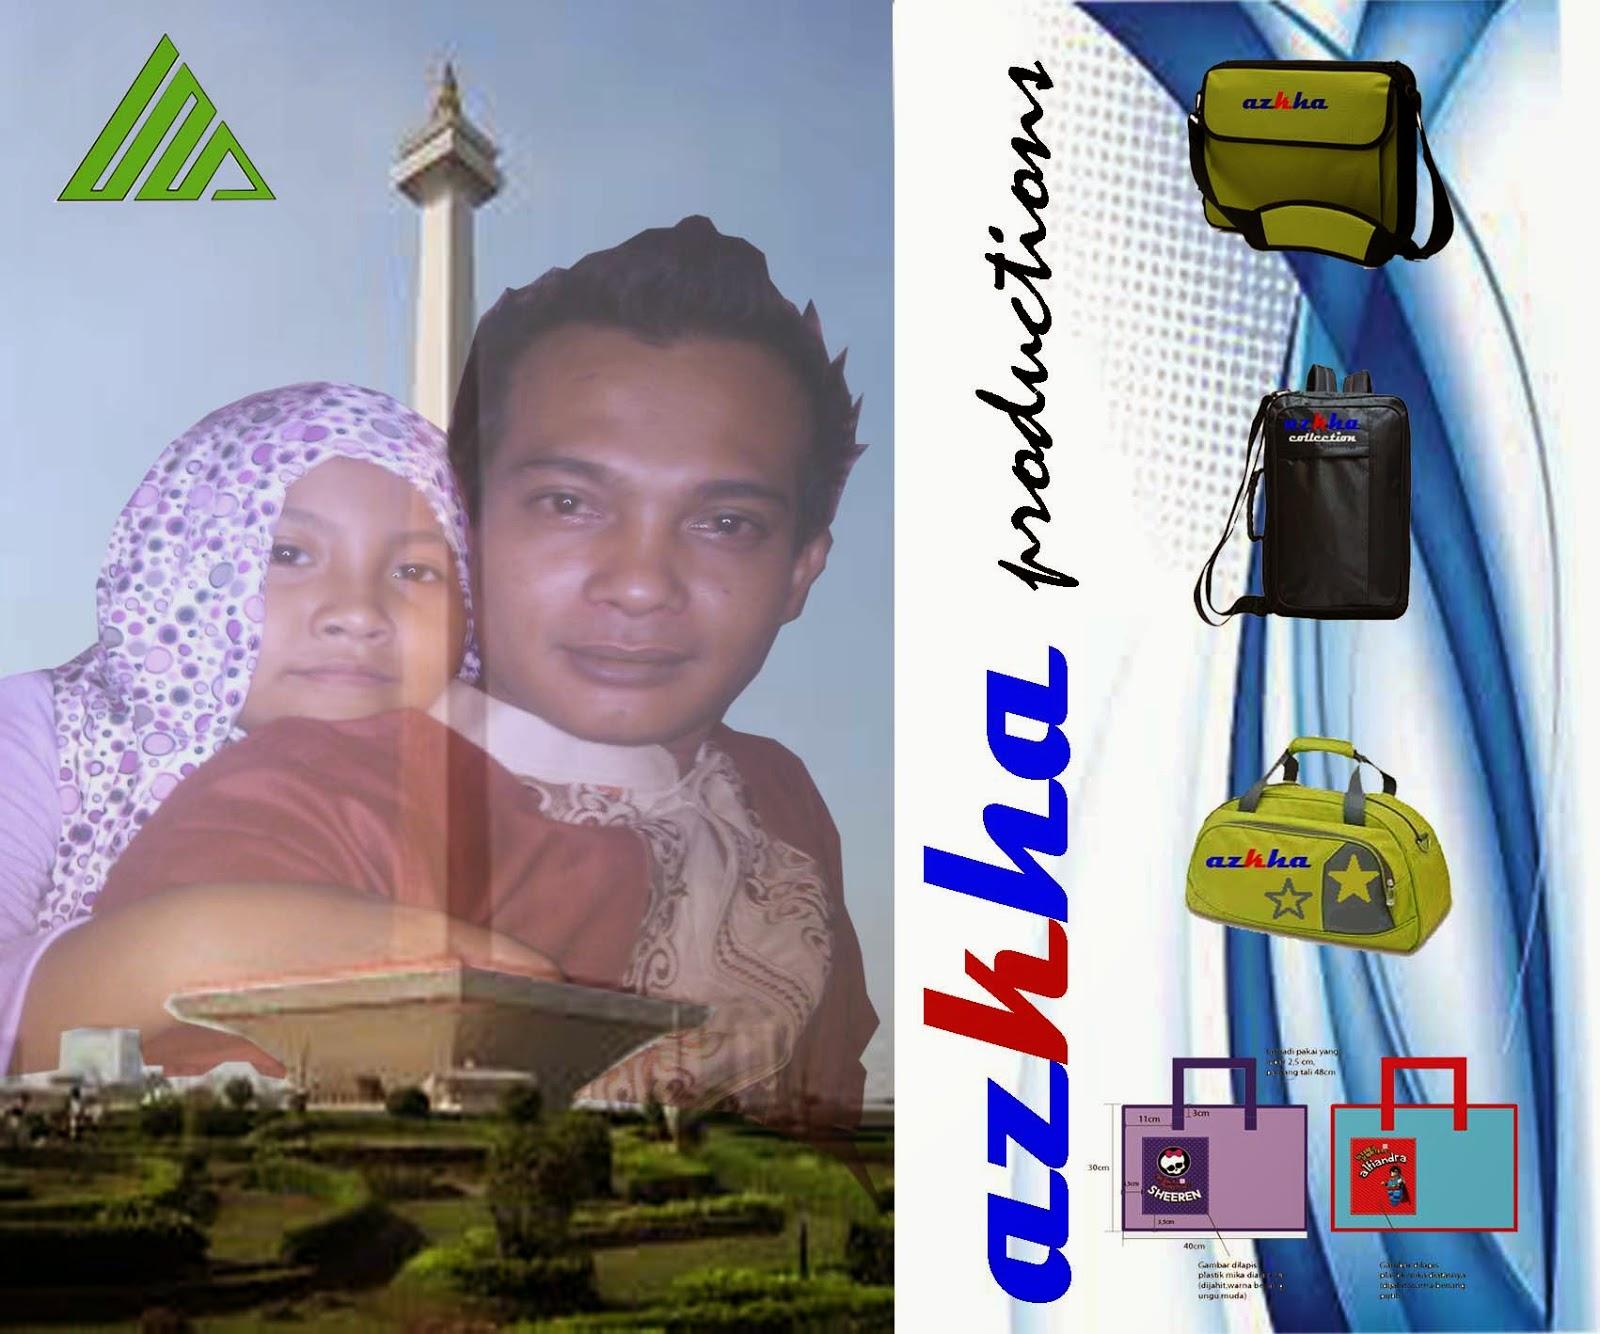 konveksi tas jakarta · konveksi tas koper · konveksitas · promosi koper tas · tas bayi murah jakarta · tas koper murah jakarta · tas wanita Jakarta